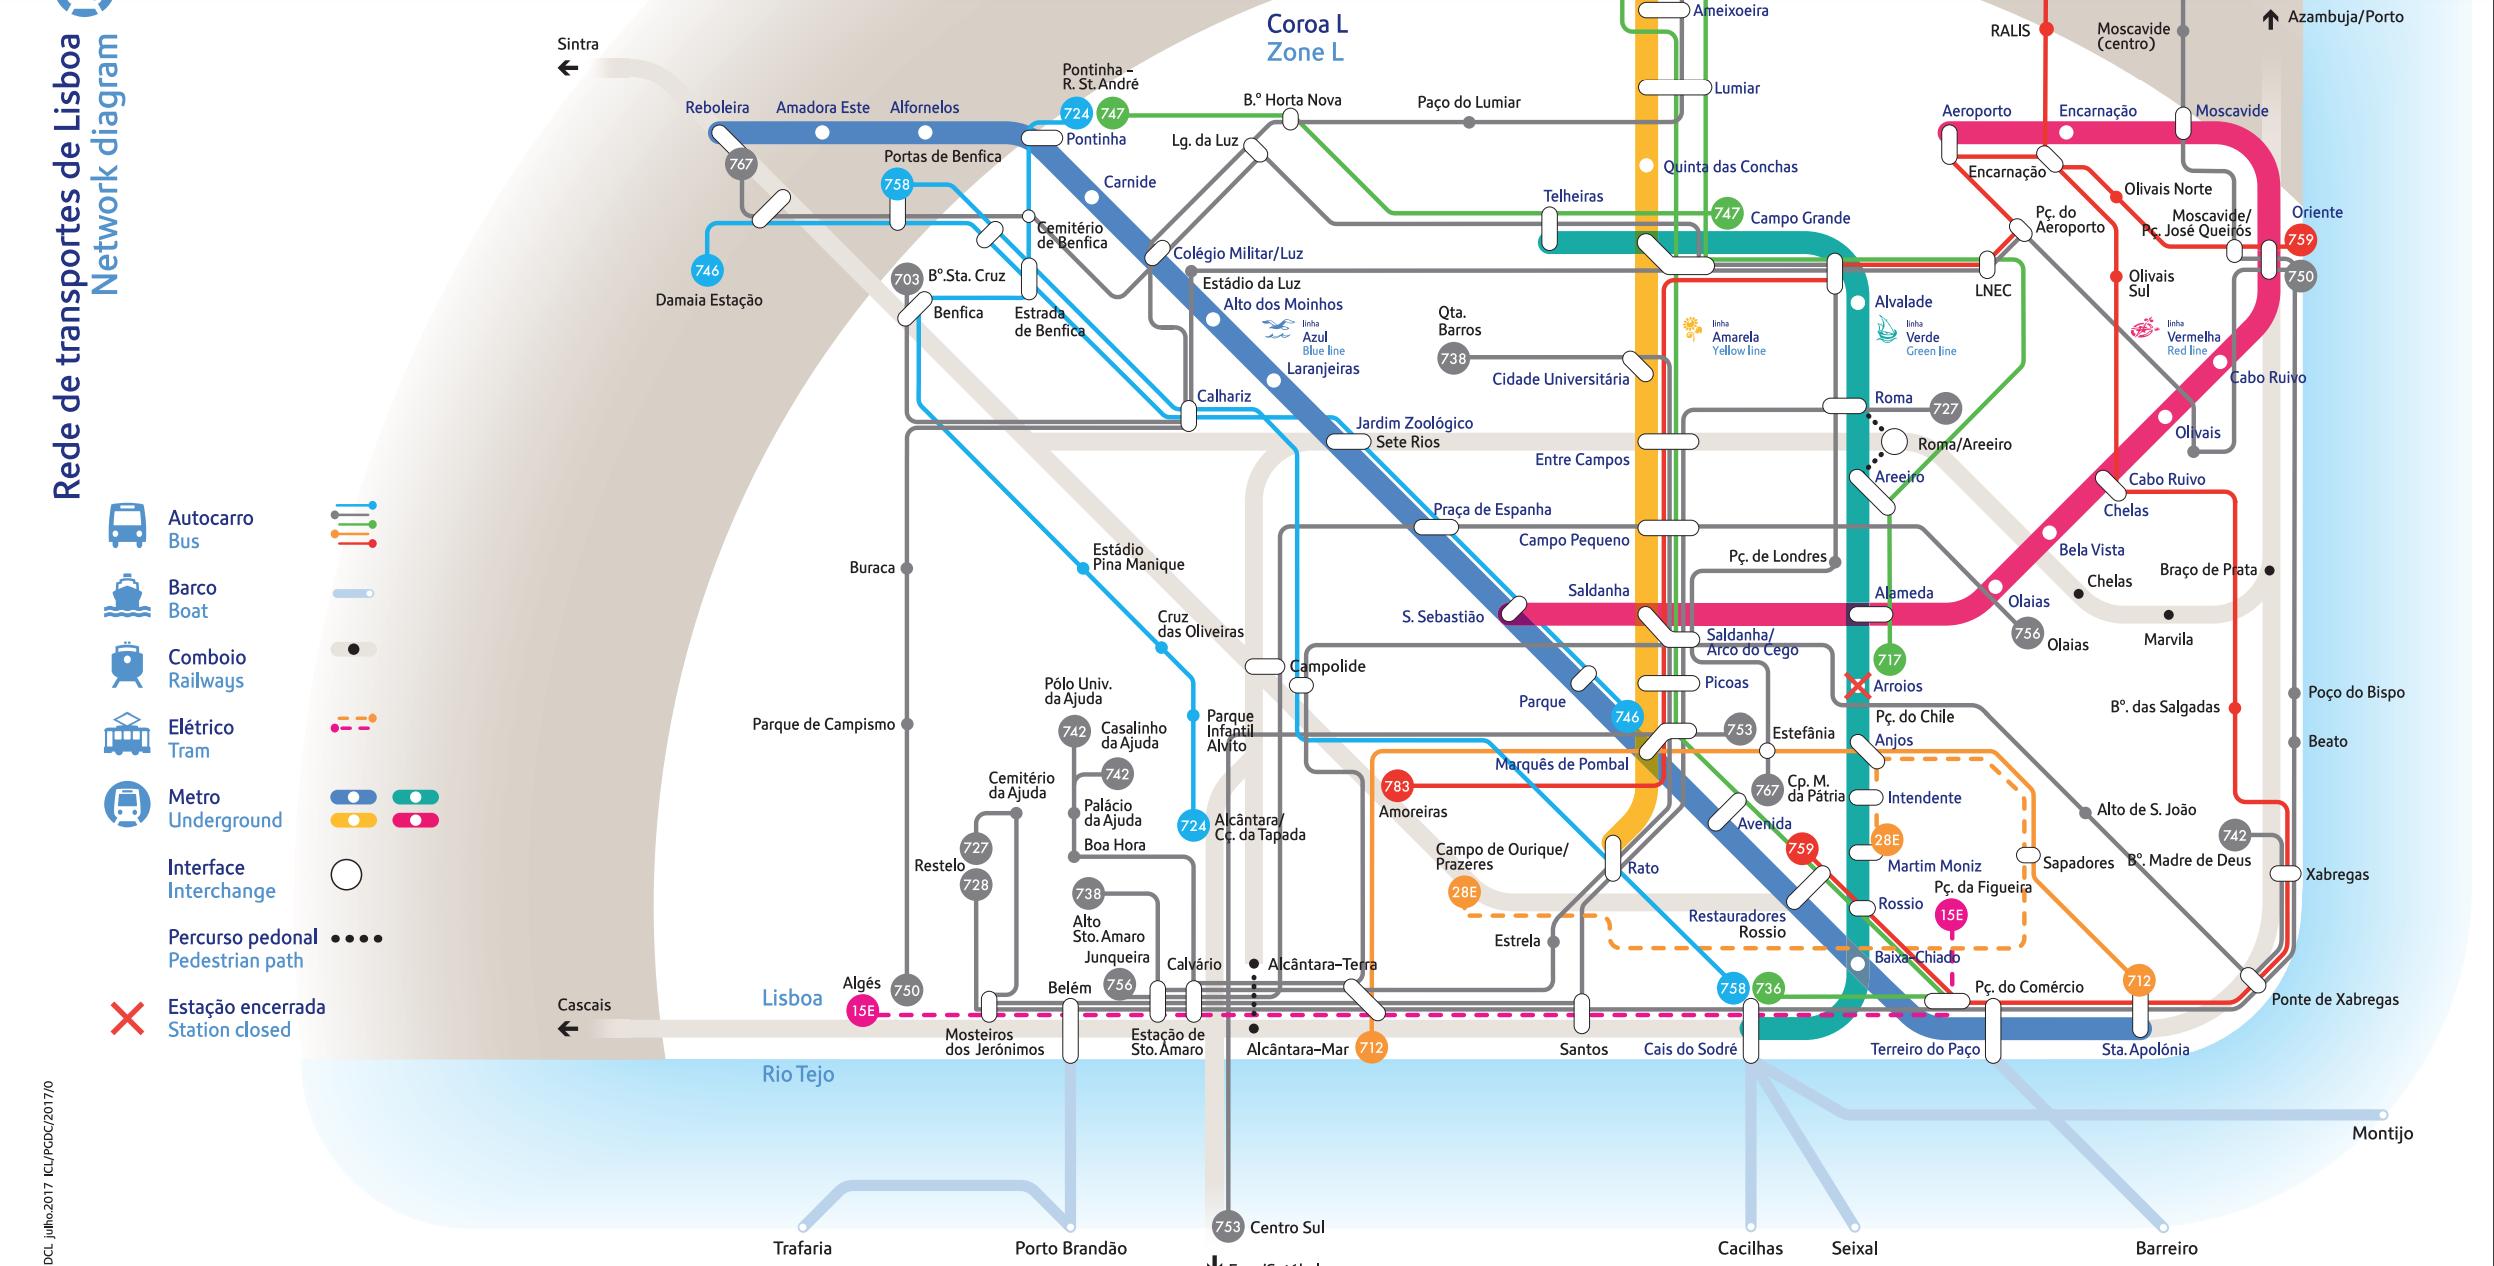 Карта транспорта Лиссабона